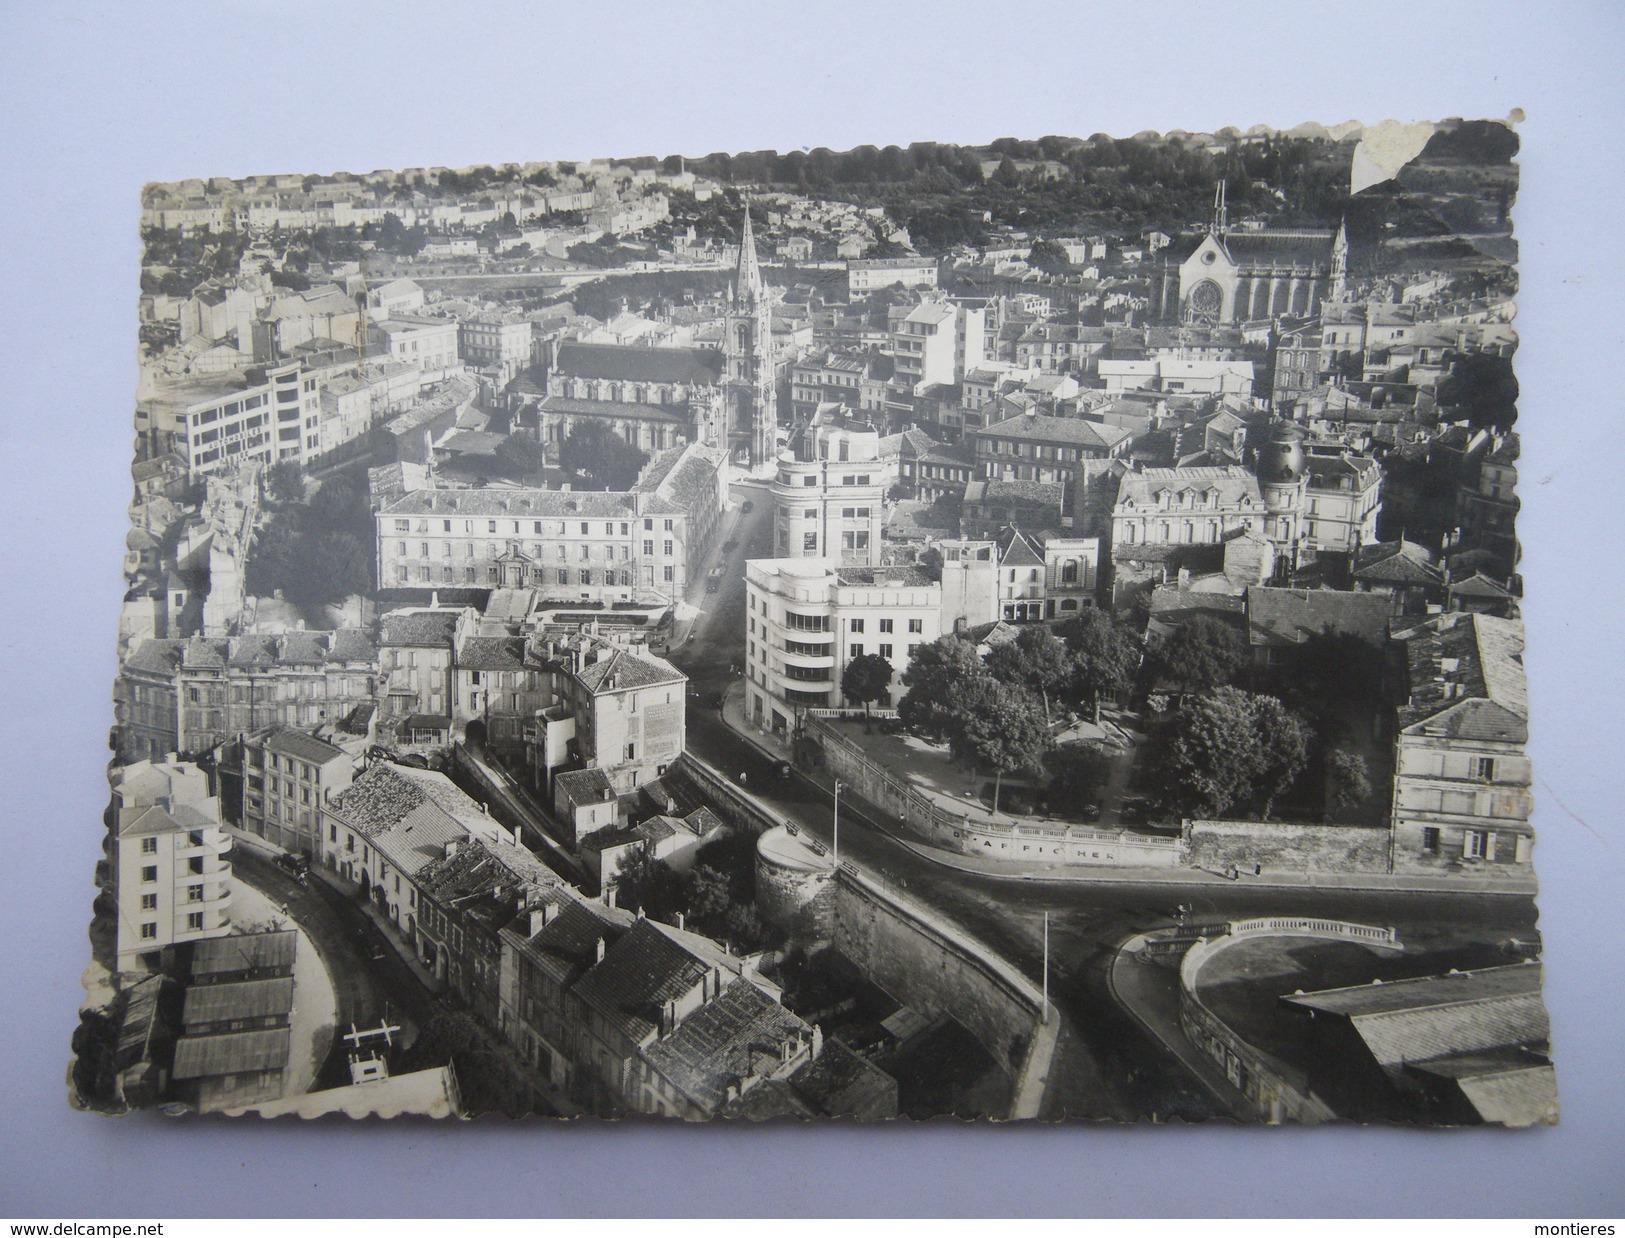 CPSM 16 - CHARENTE - ANGOULÊME L'EGLISE SAINT-MARTIAL - Angouleme